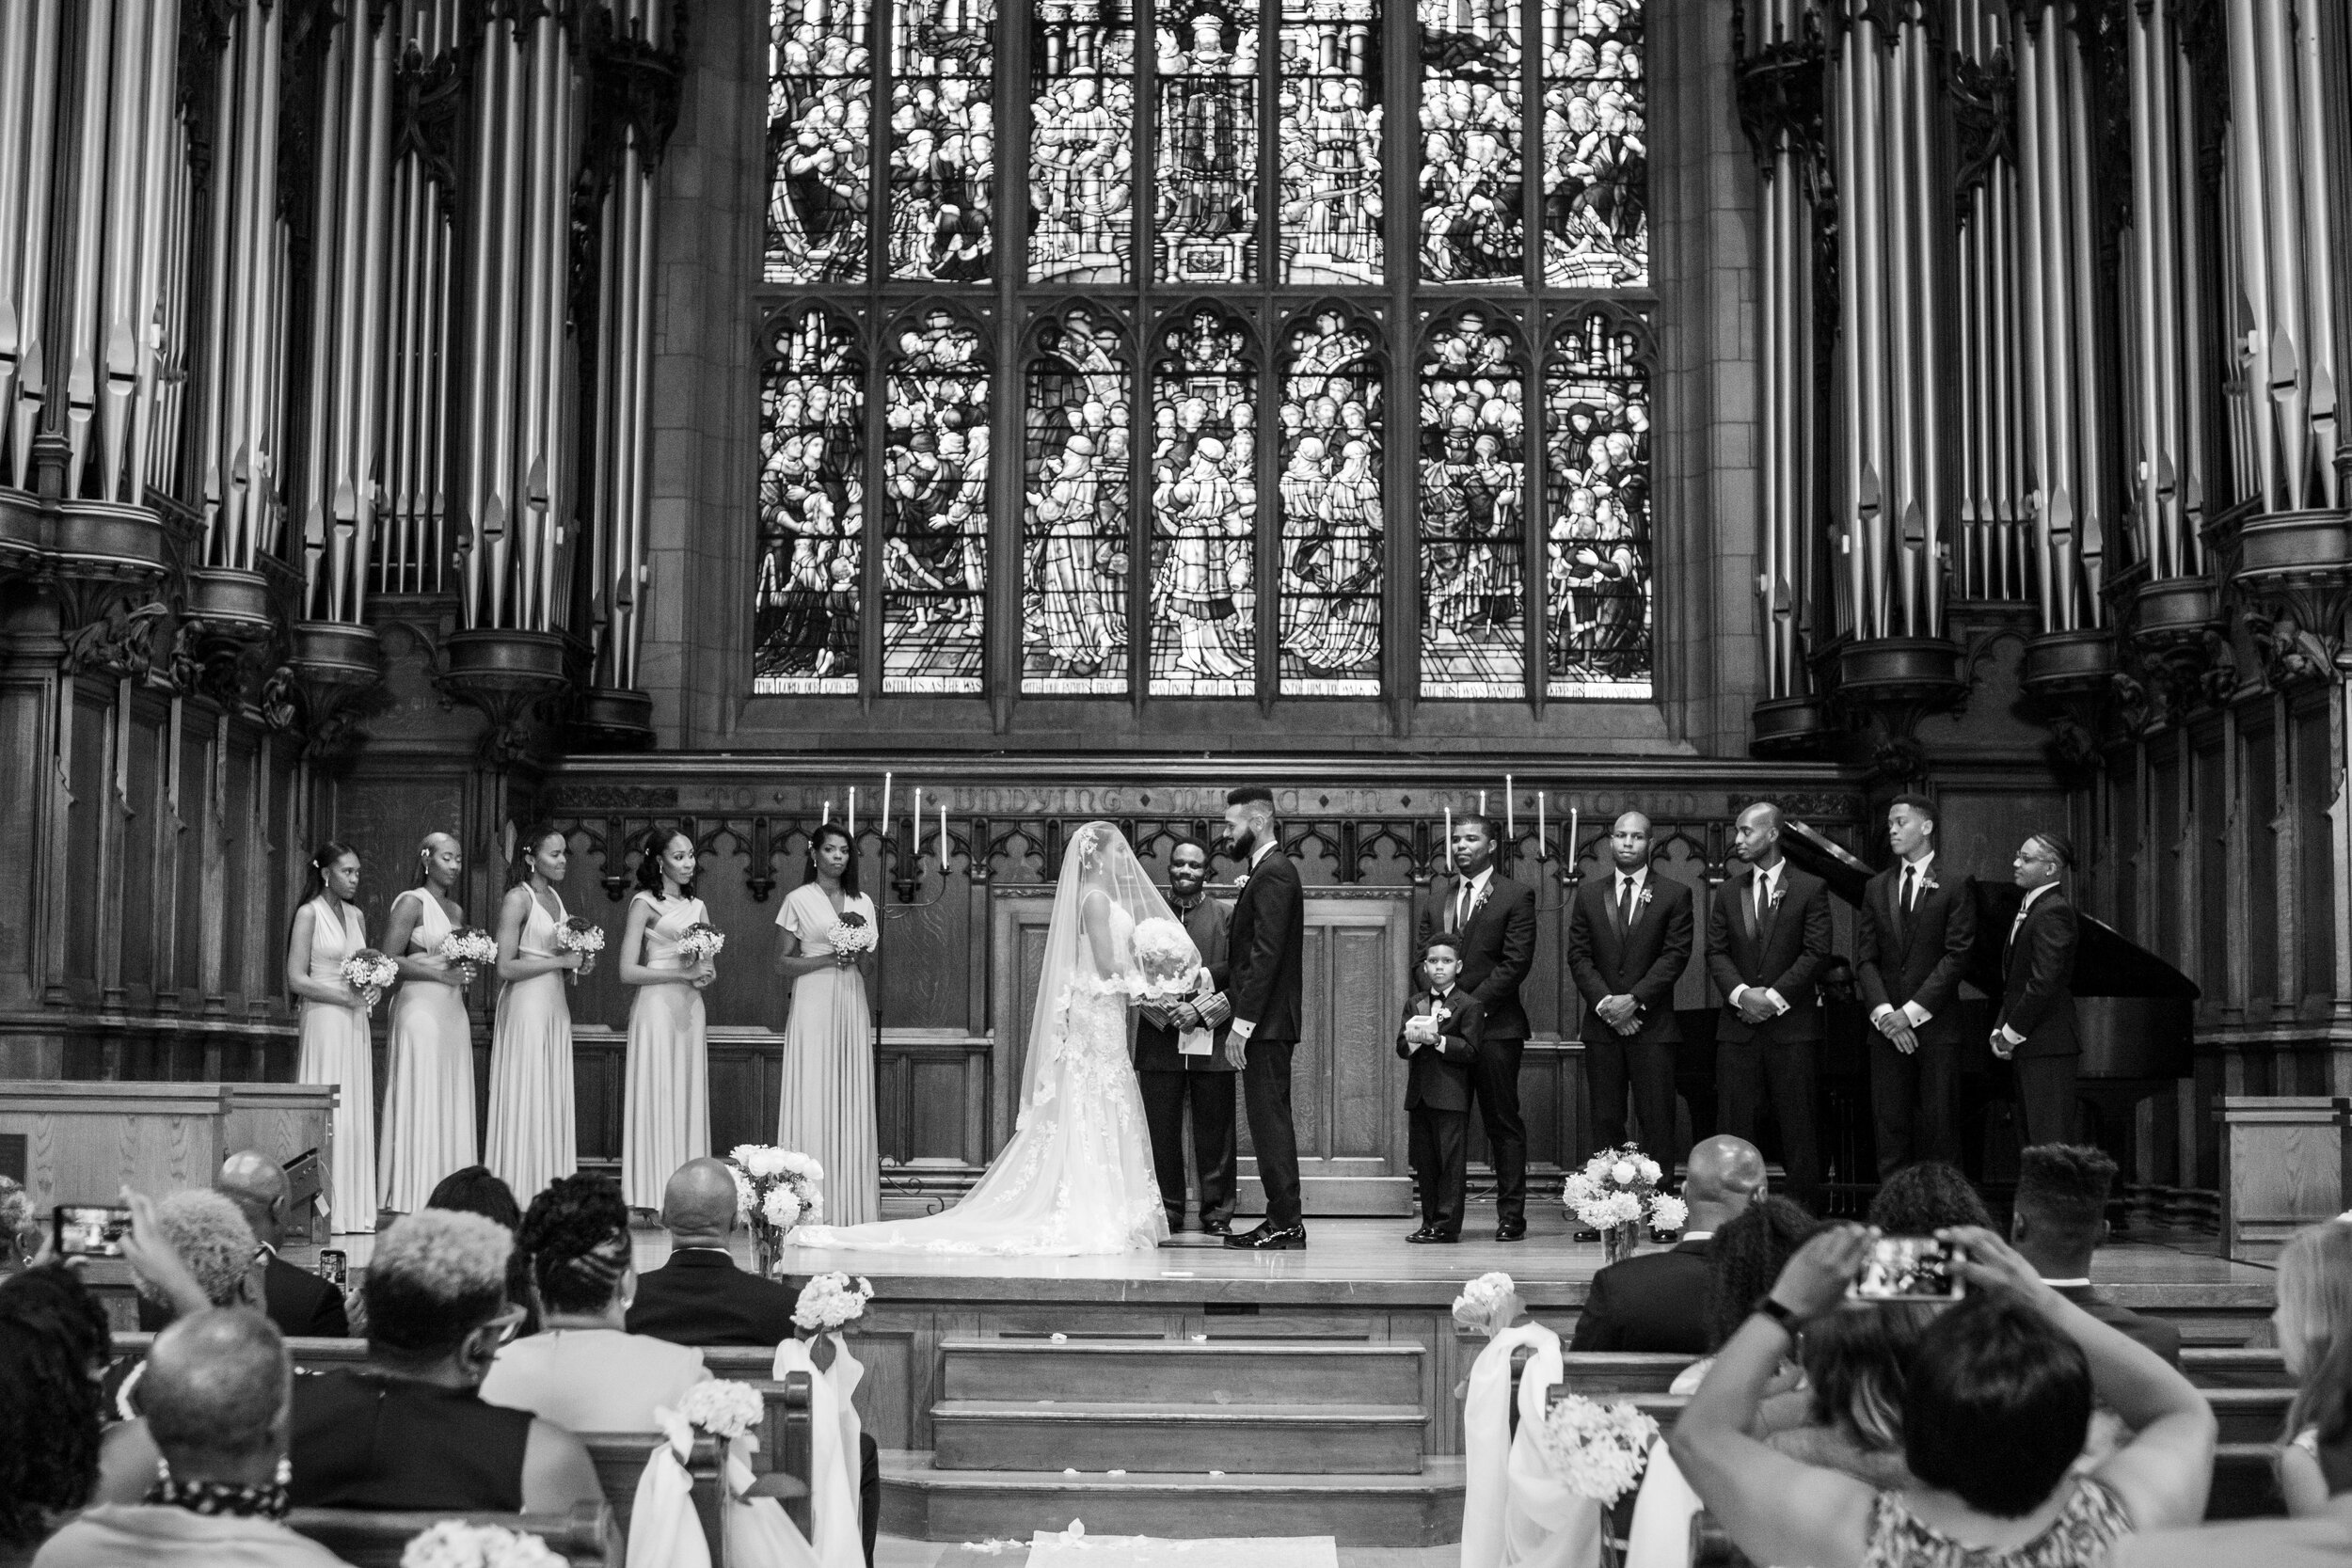 8_3_2019_BONTY_WEDDING-332.jpg